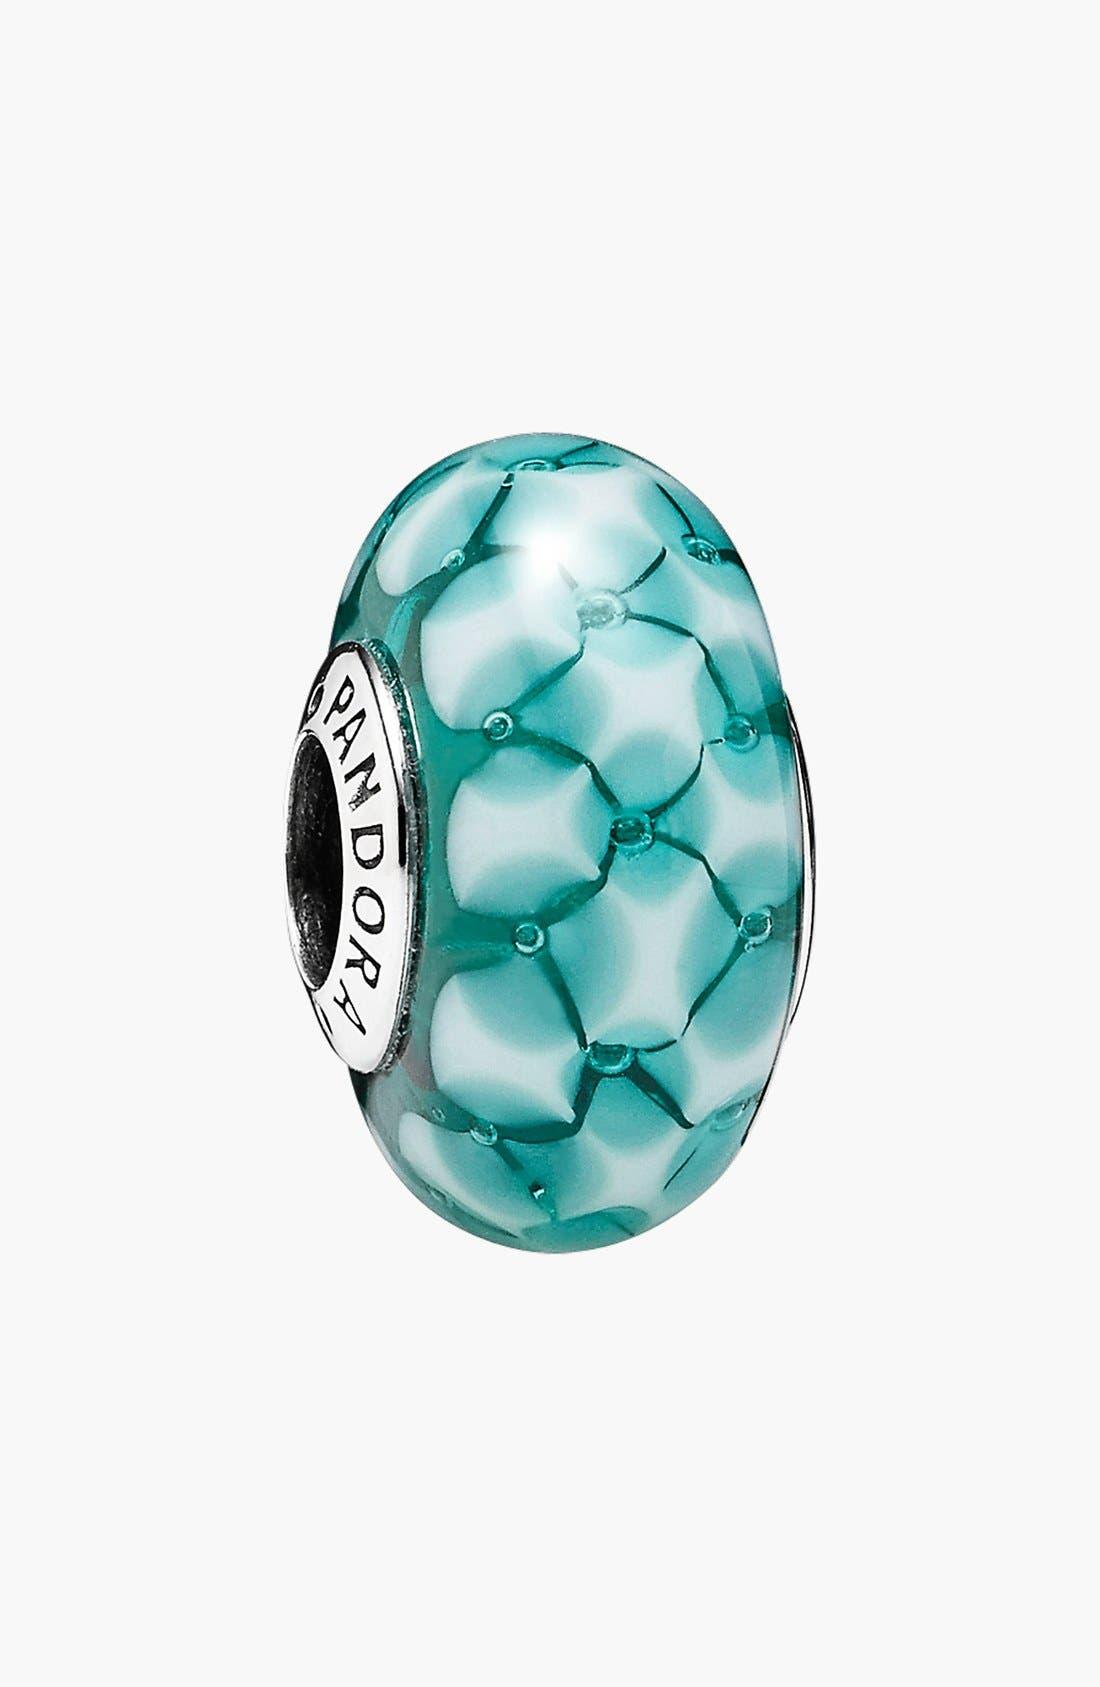 Alternate Image 1 Selected - PANDORA 'Teal Lattice' Murano Glass Bead Charm